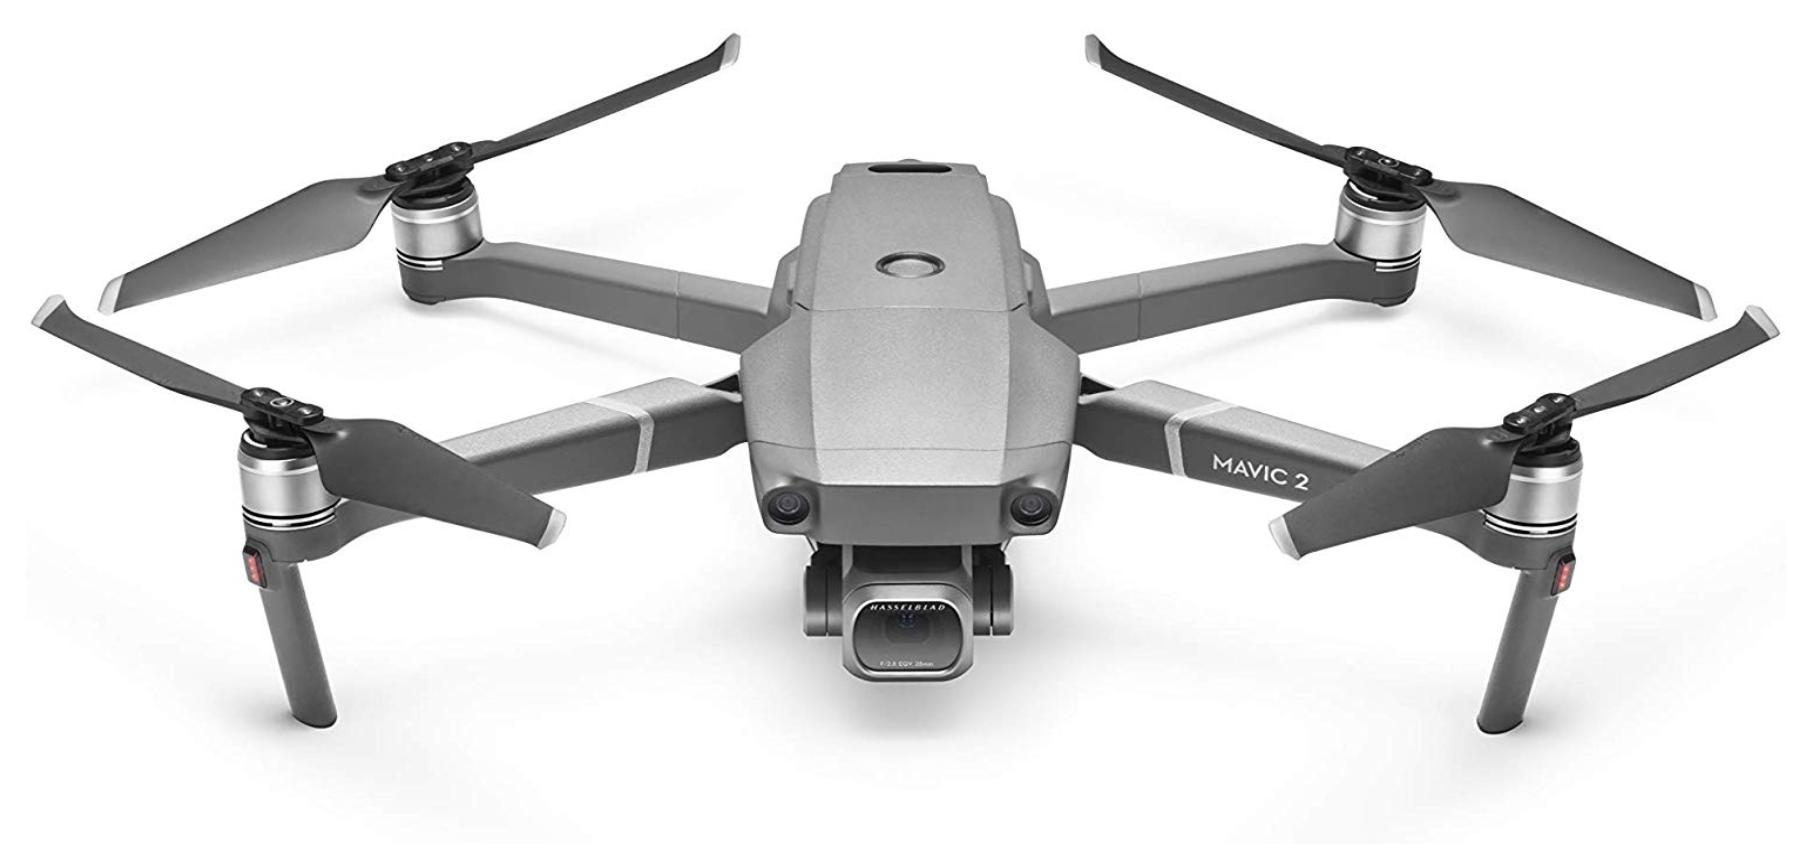 DJI Mavic 2 Pro drone for beginners